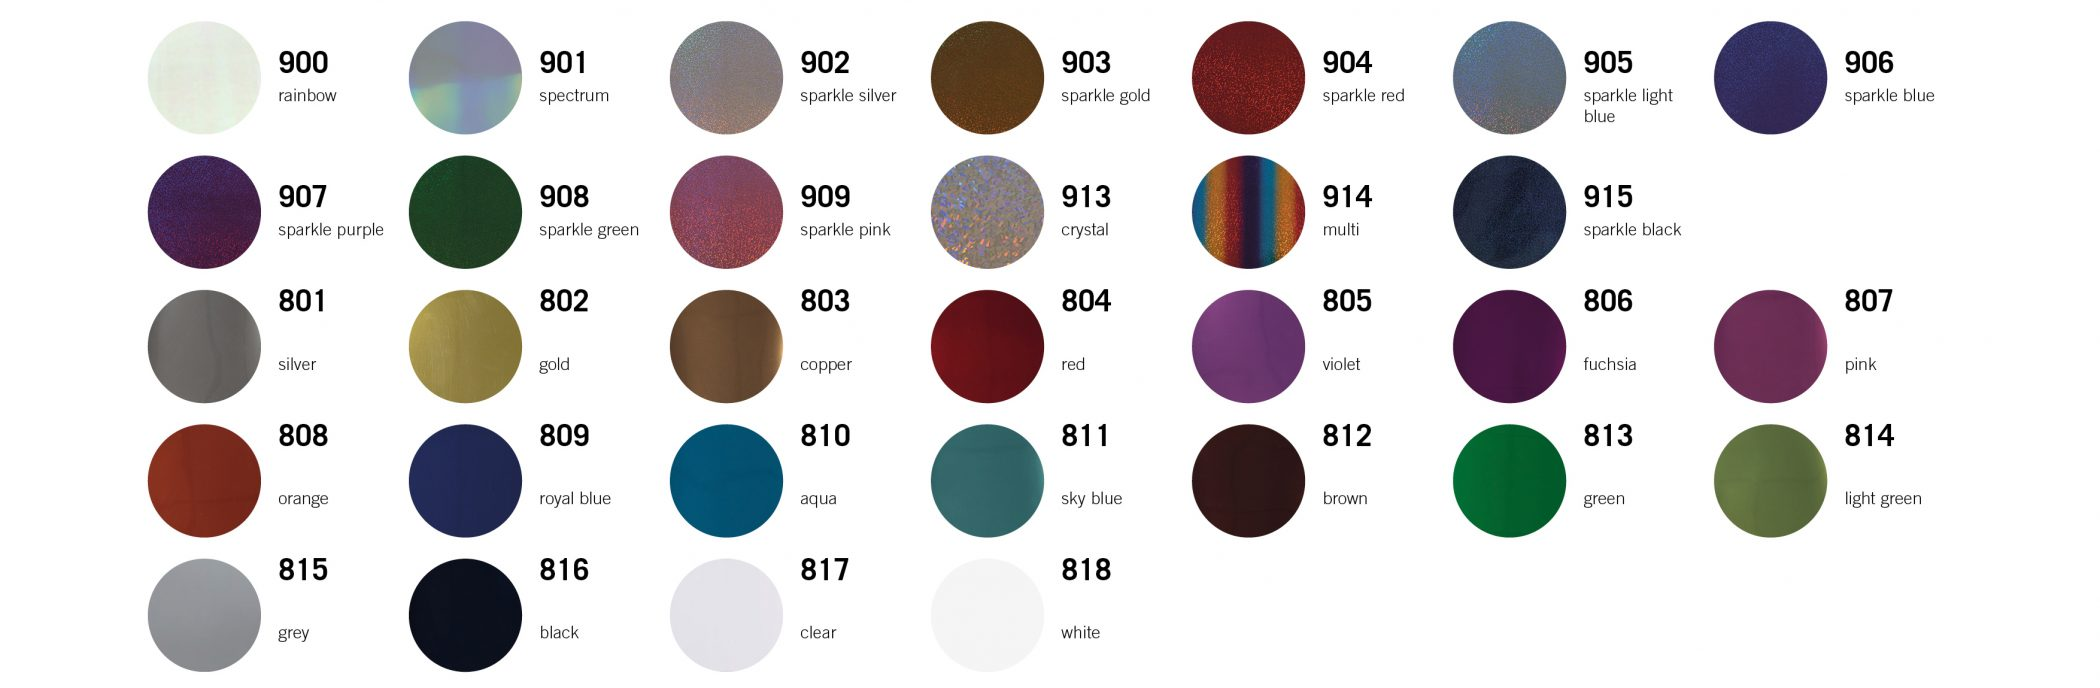 CAD-CUT_Color-selection_Effect_Stahls-Asia_07-21